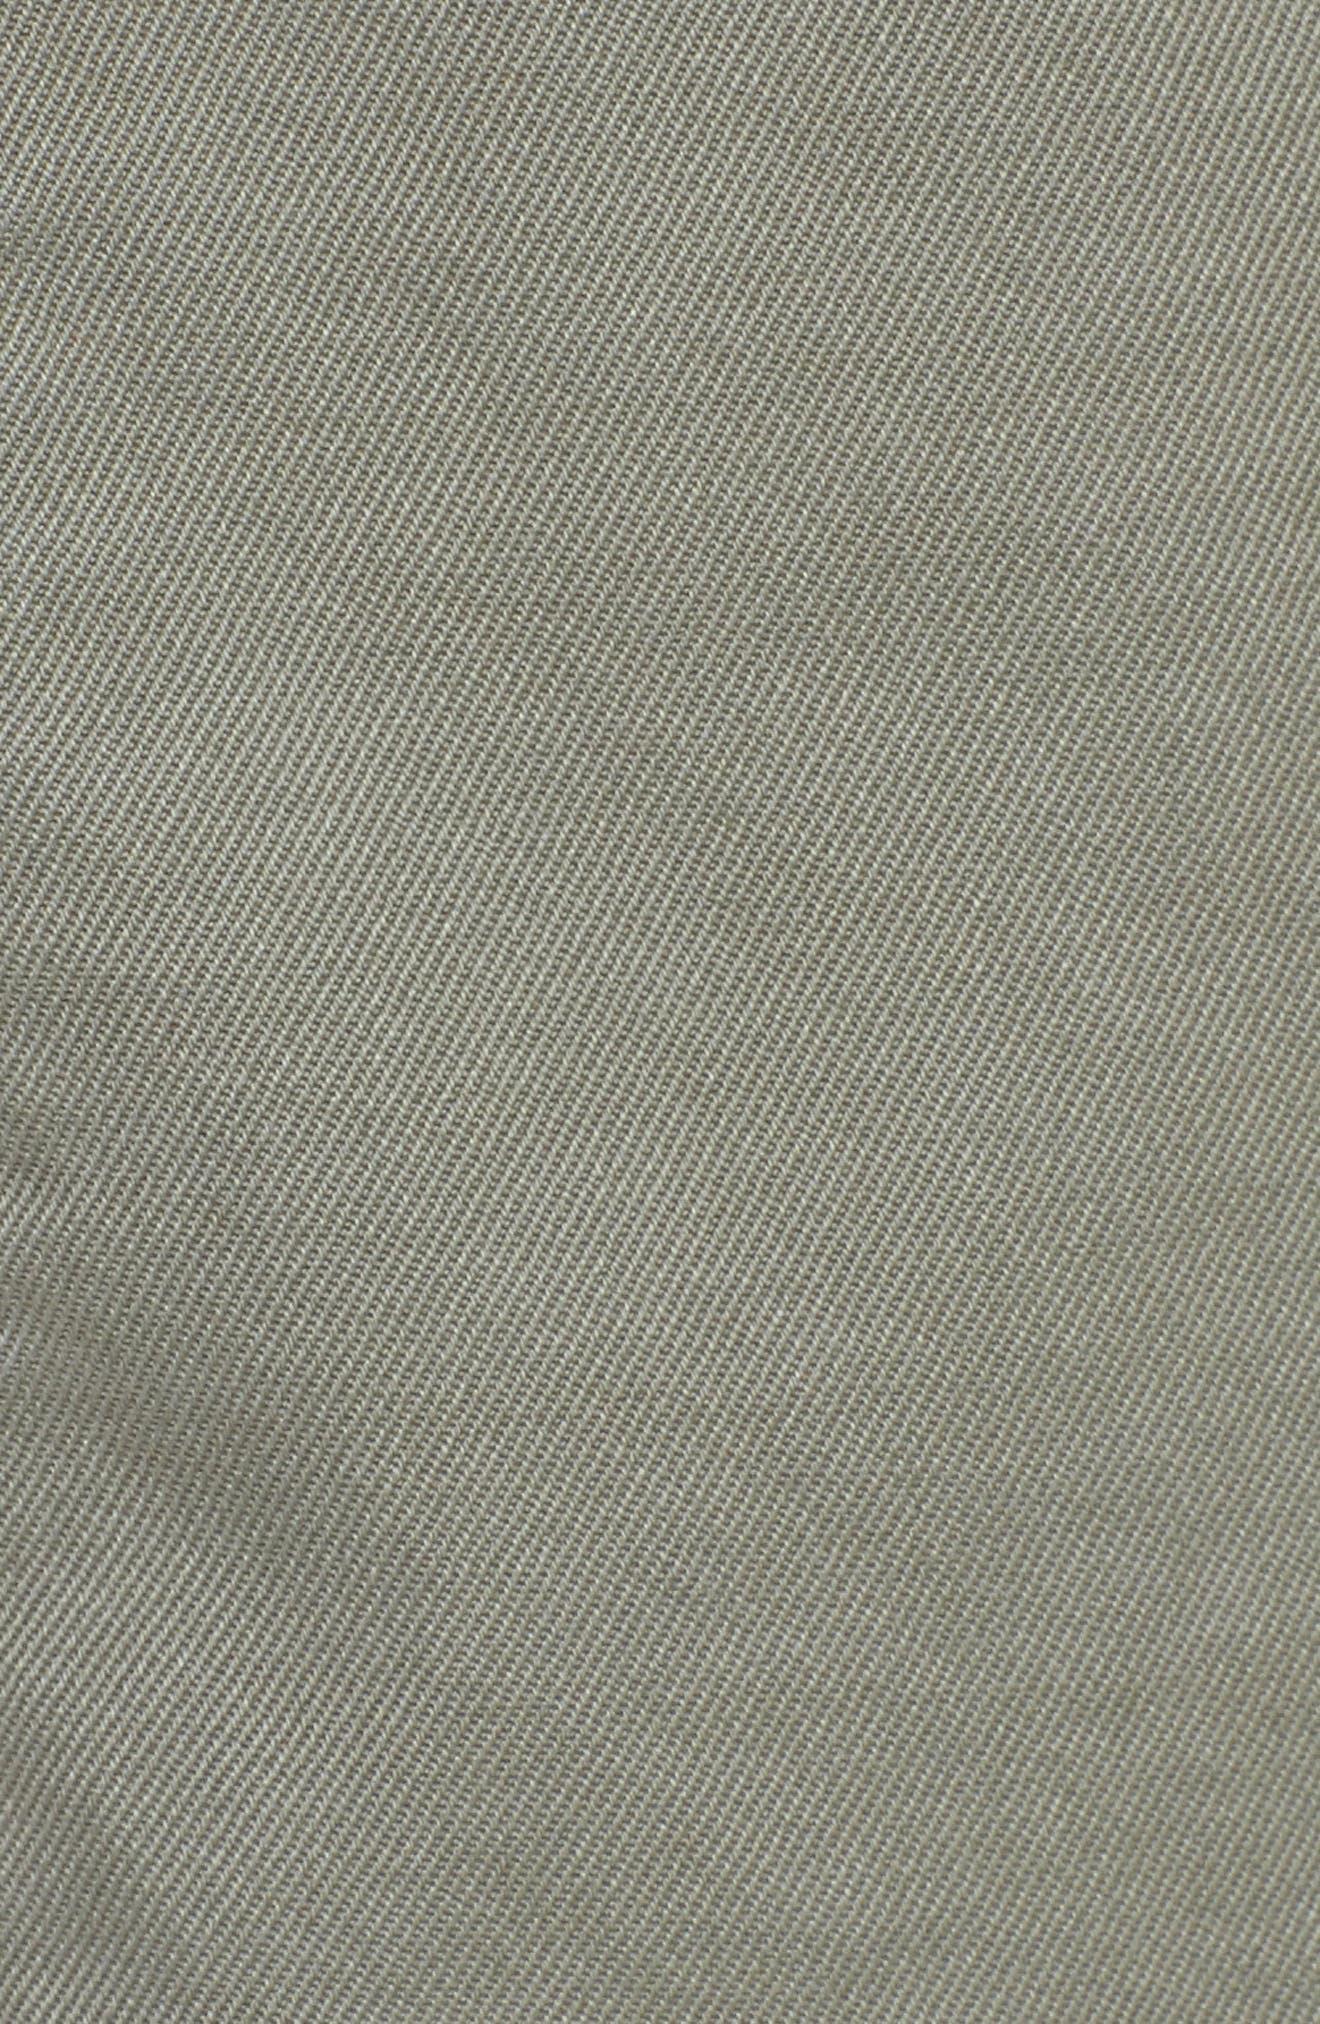 Flynn Low Rise Military Shorts,                             Alternate thumbnail 6, color,                             410